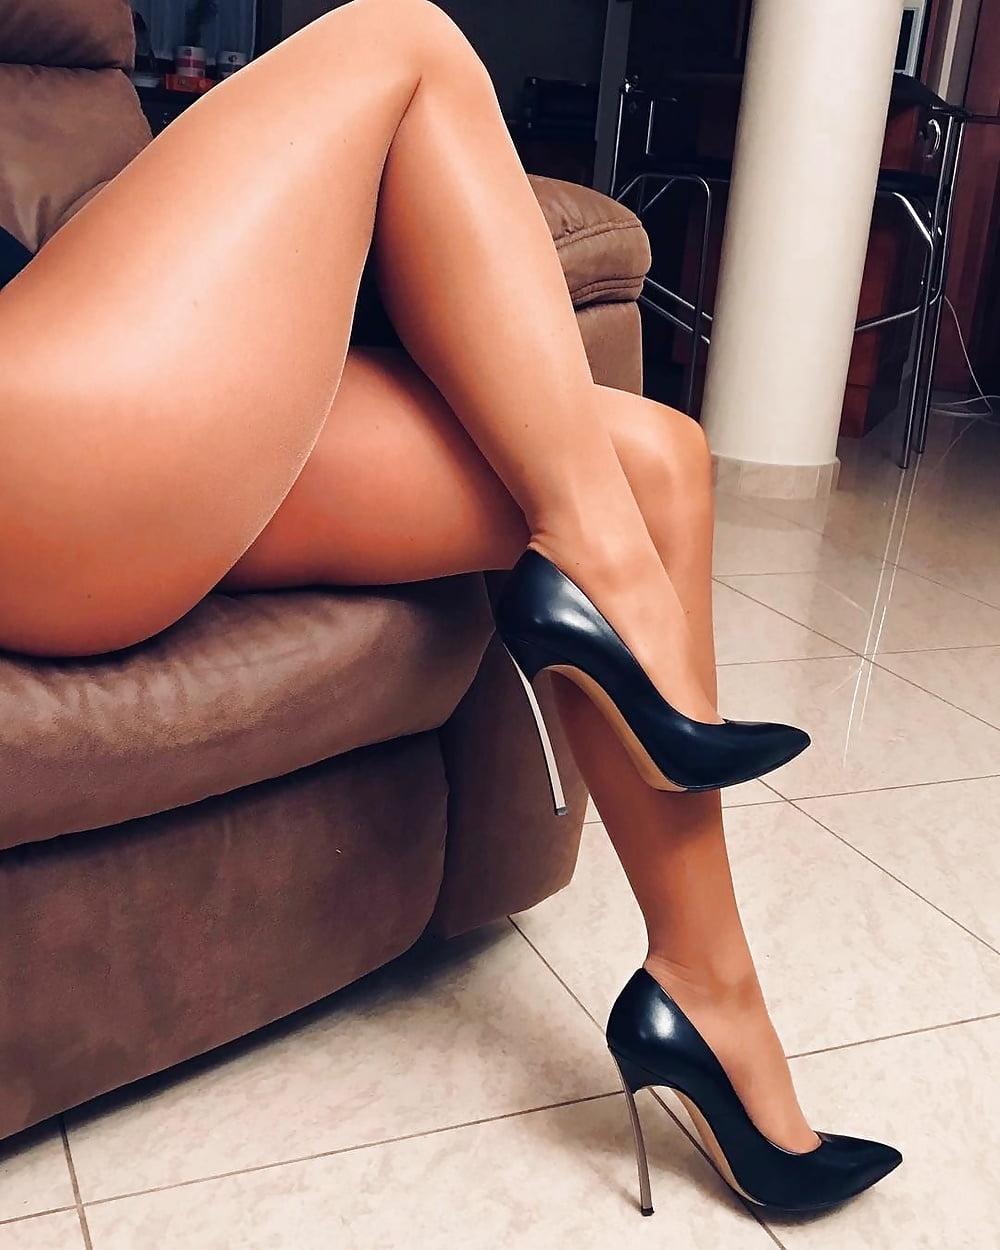 Ebony women legs pantyhose free sites lesbain